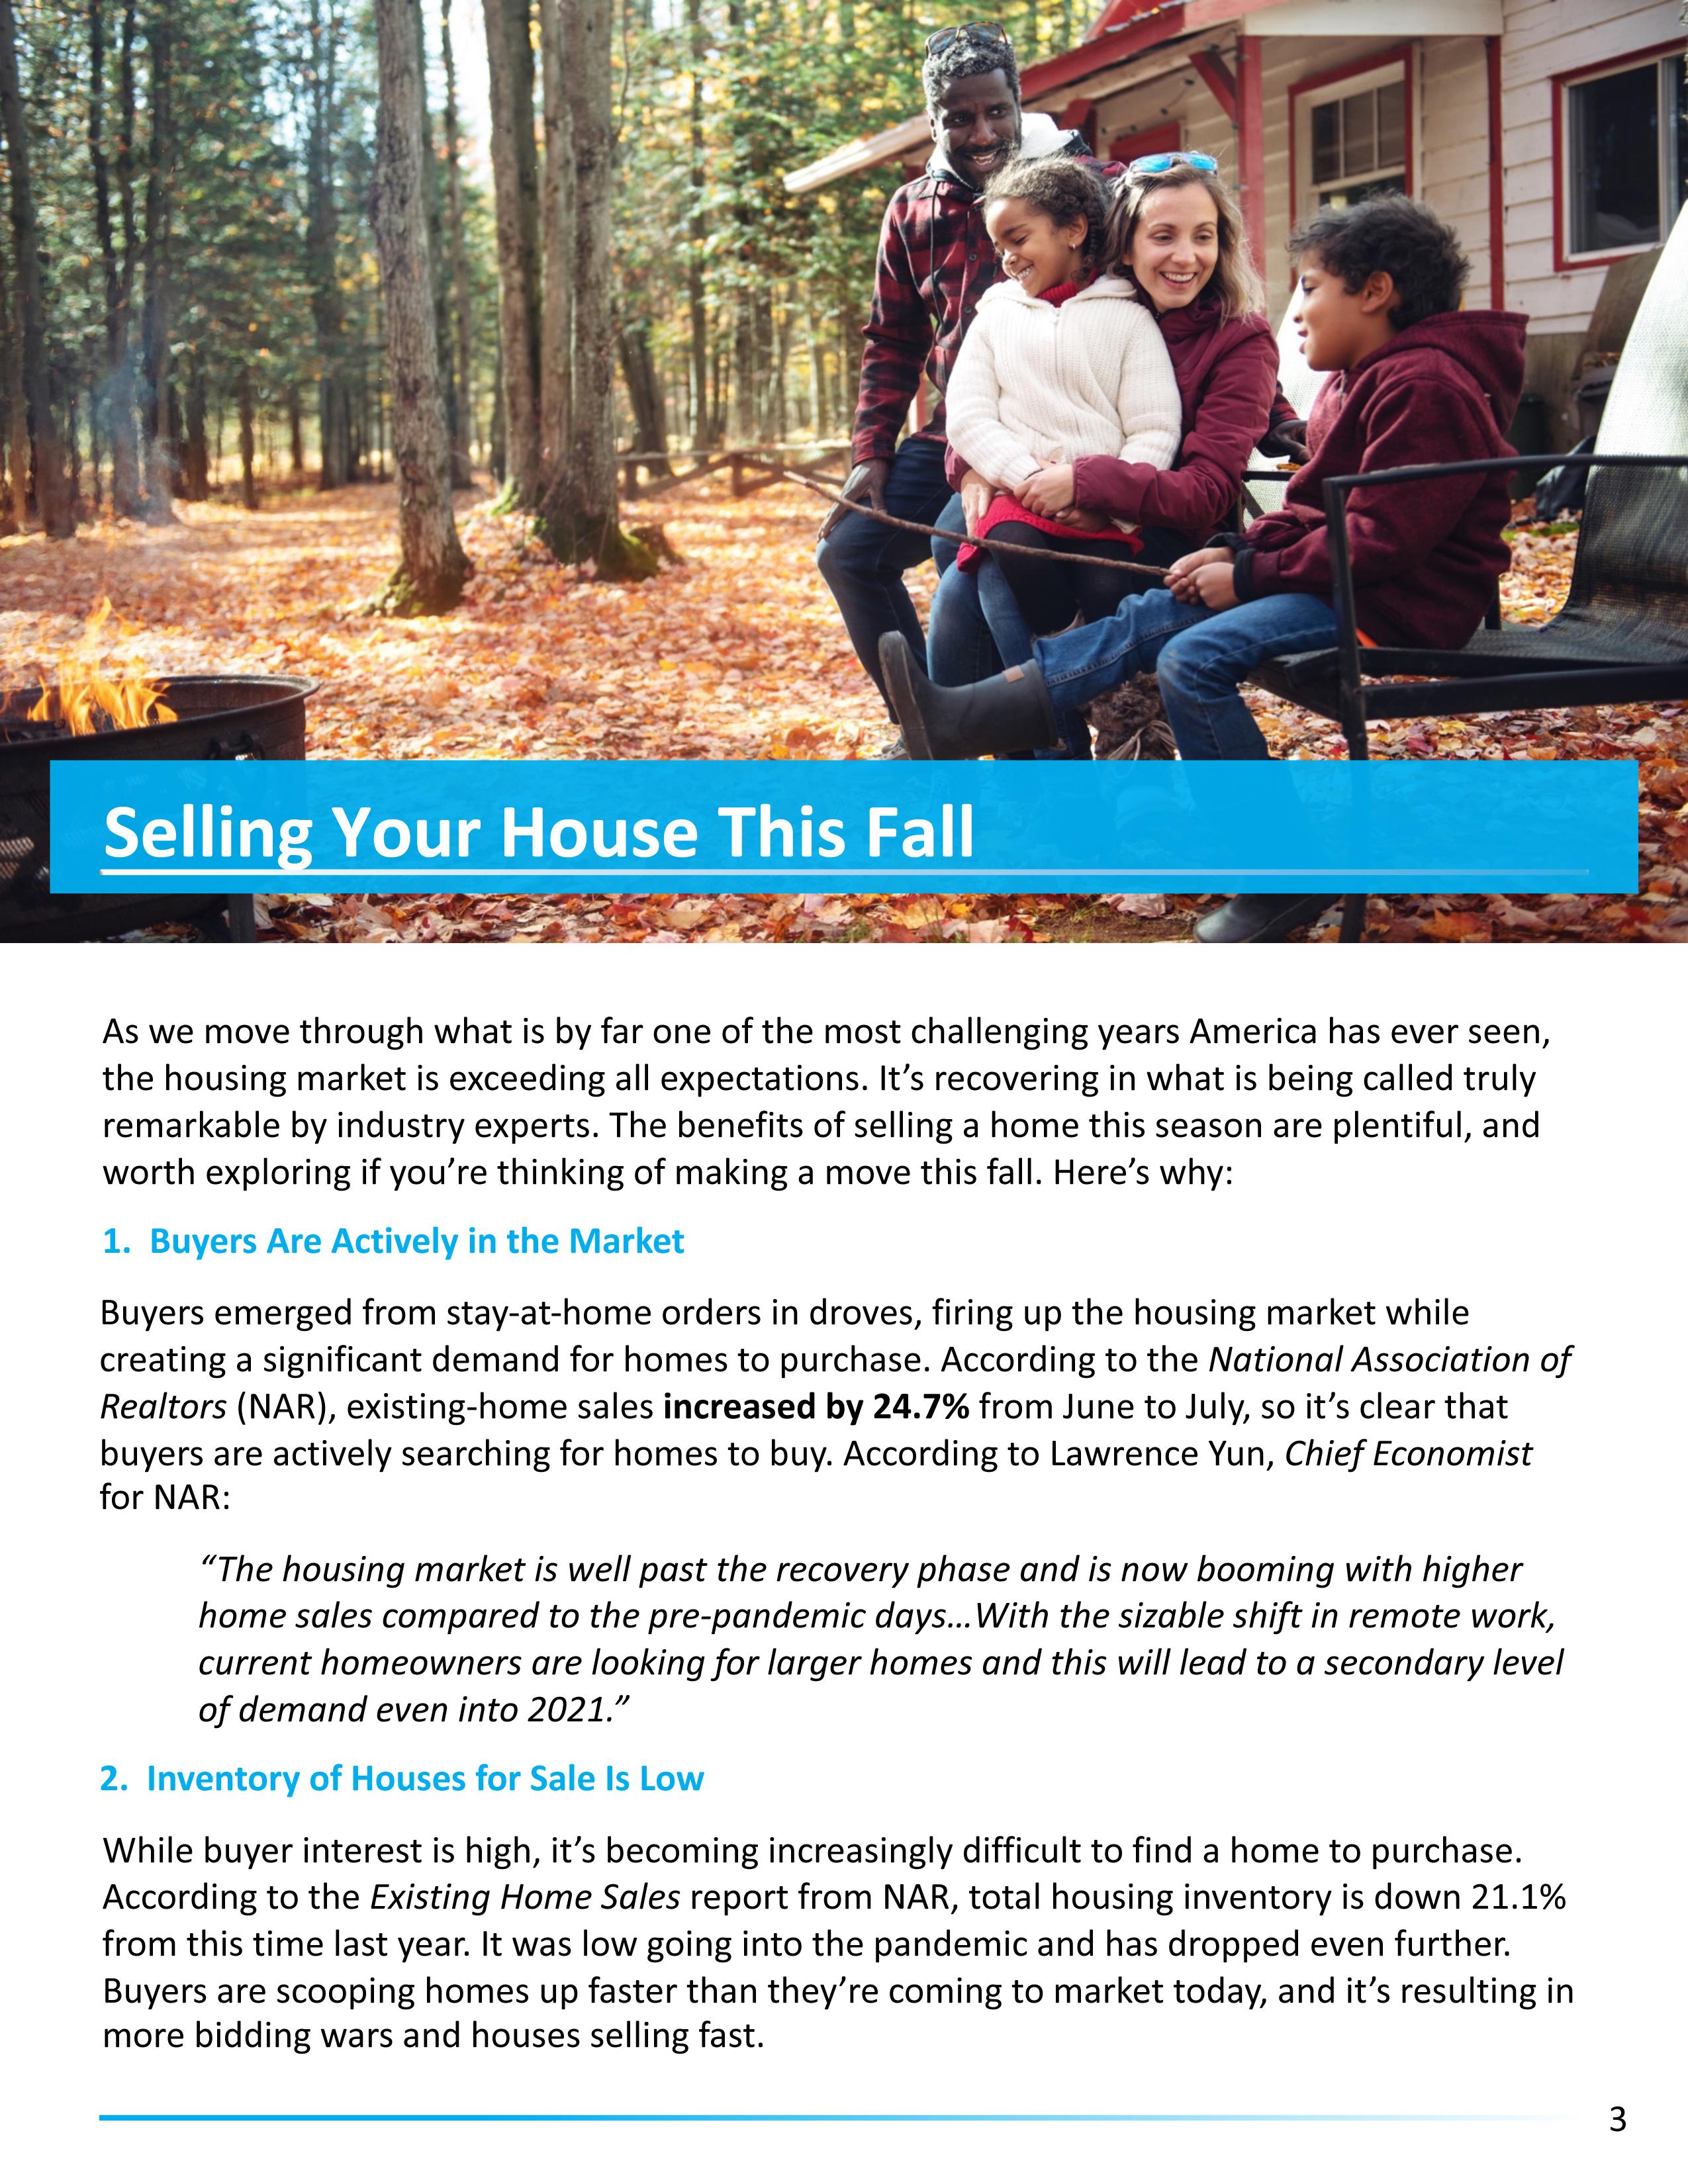 SellingYourHouseFall2020-3.jpg